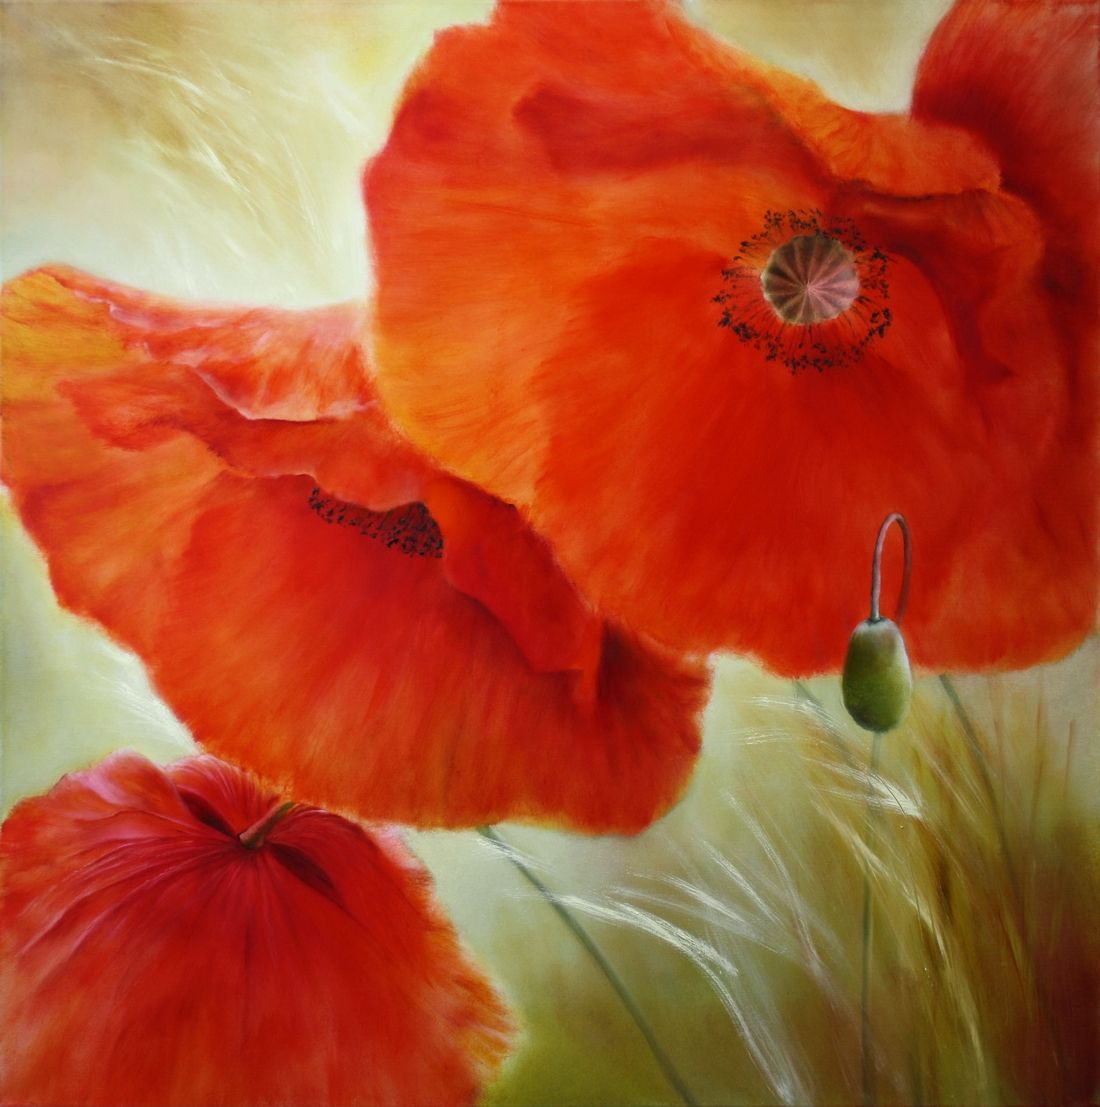 Ol Auf Leinwand 100 X 100 Cm Www Annette Schmucker De Art Arte Artist Contemporaryart Canvas Artgallery Orig Wie Man Blumen Malt Mohnblumen Kunst Mohn